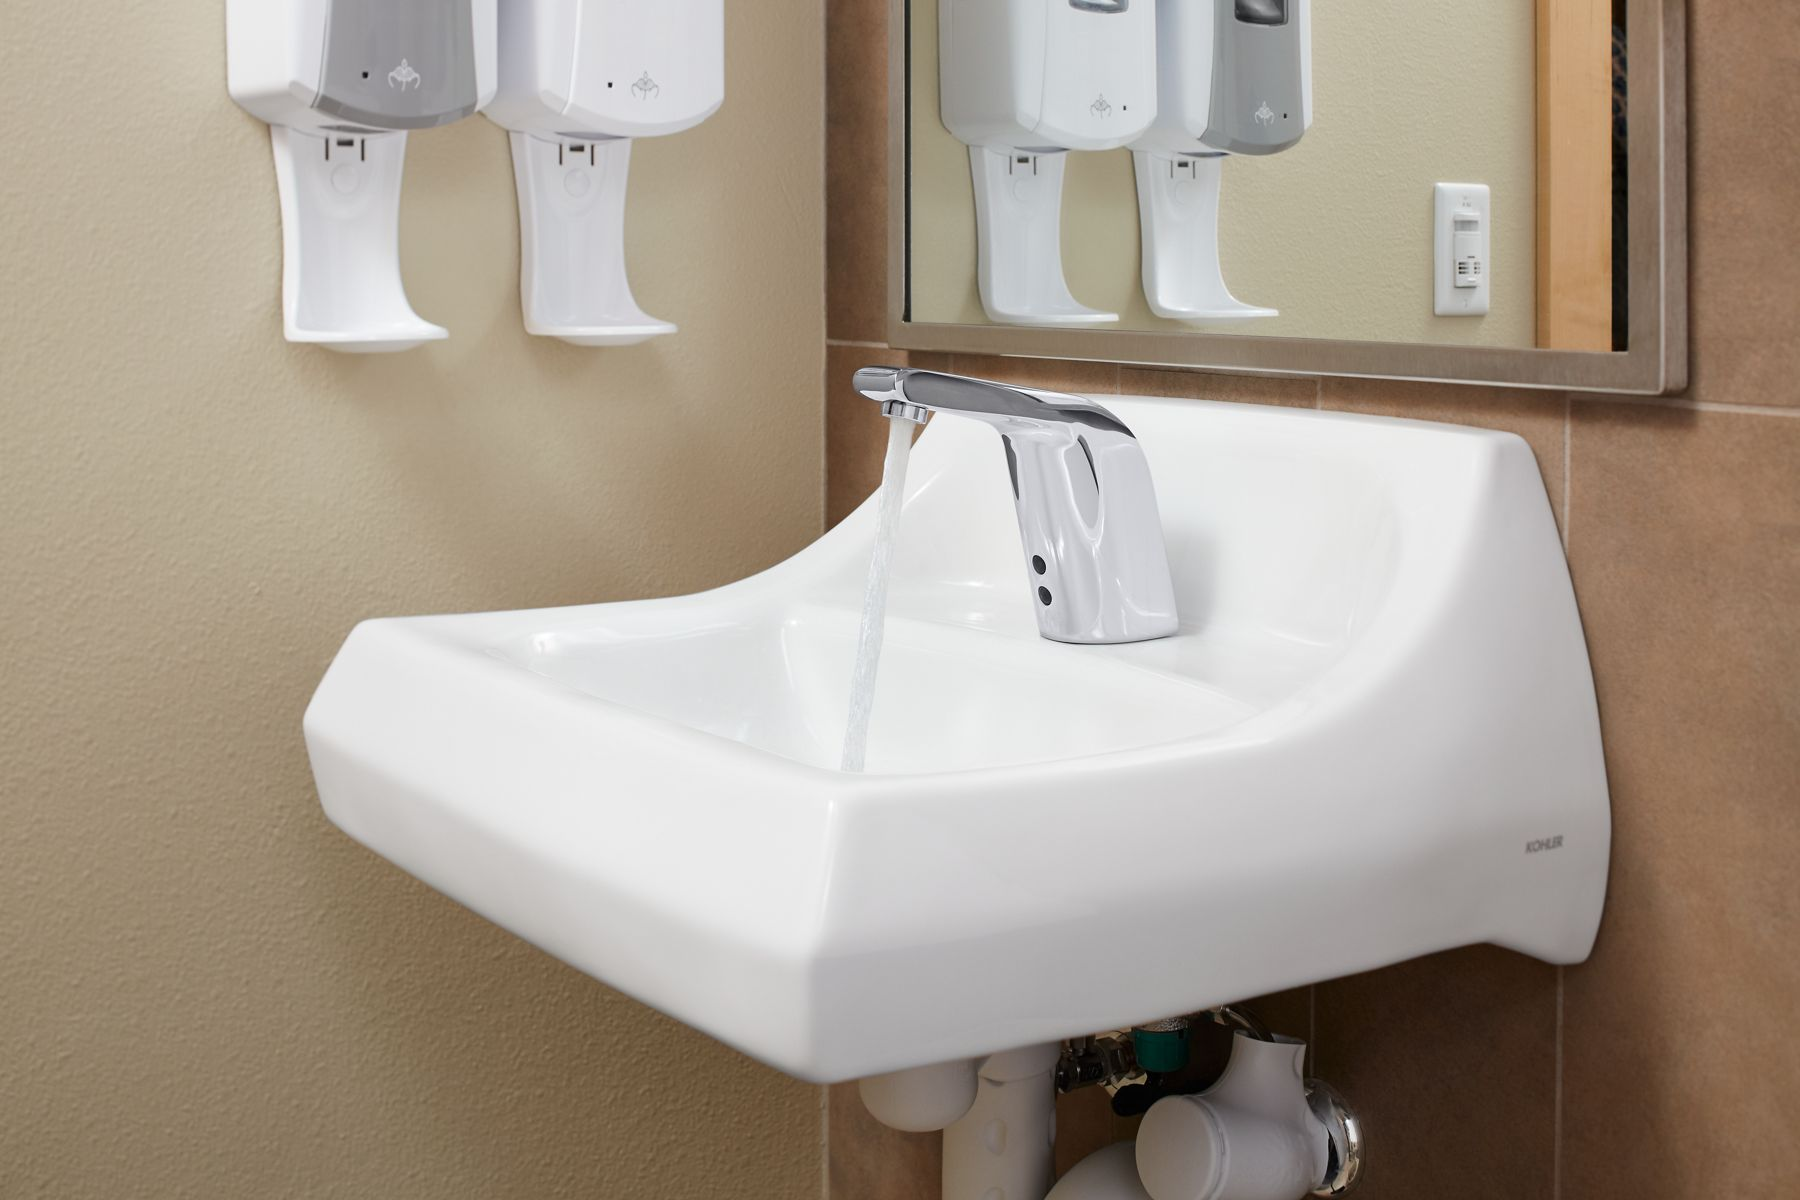 sinks commercial bathroom bathroom